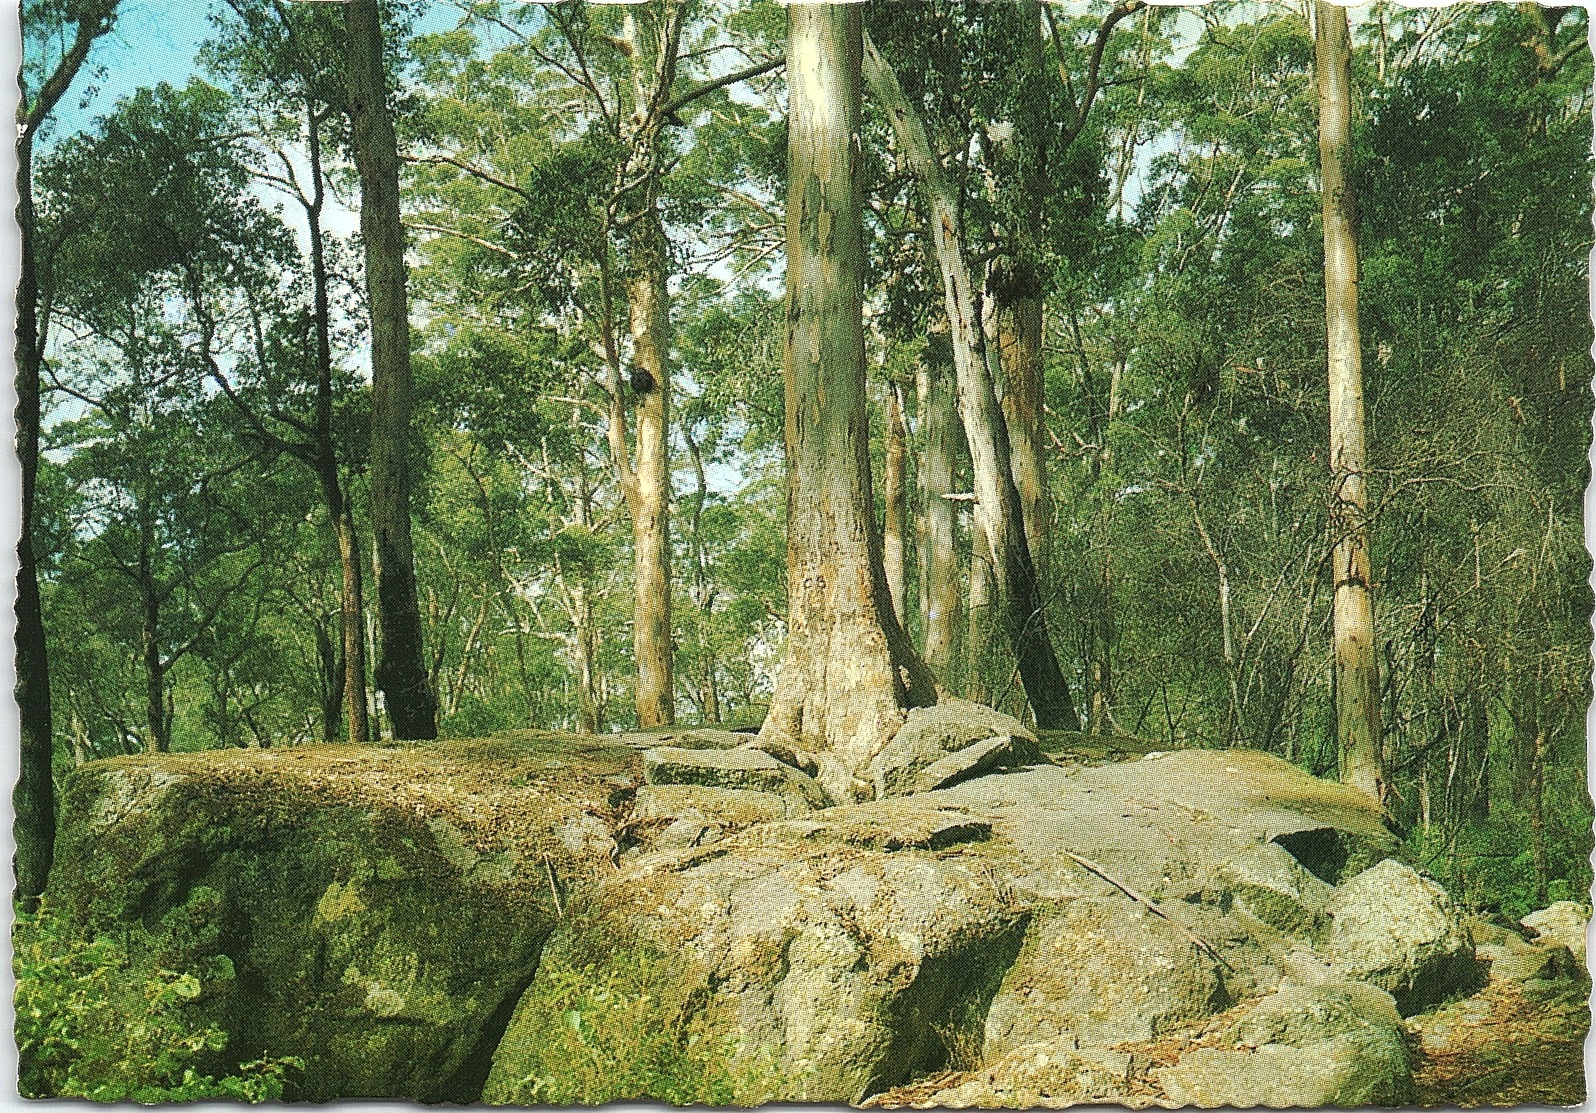 Tree In The Rock, Porongurup, Western Australia - Australie